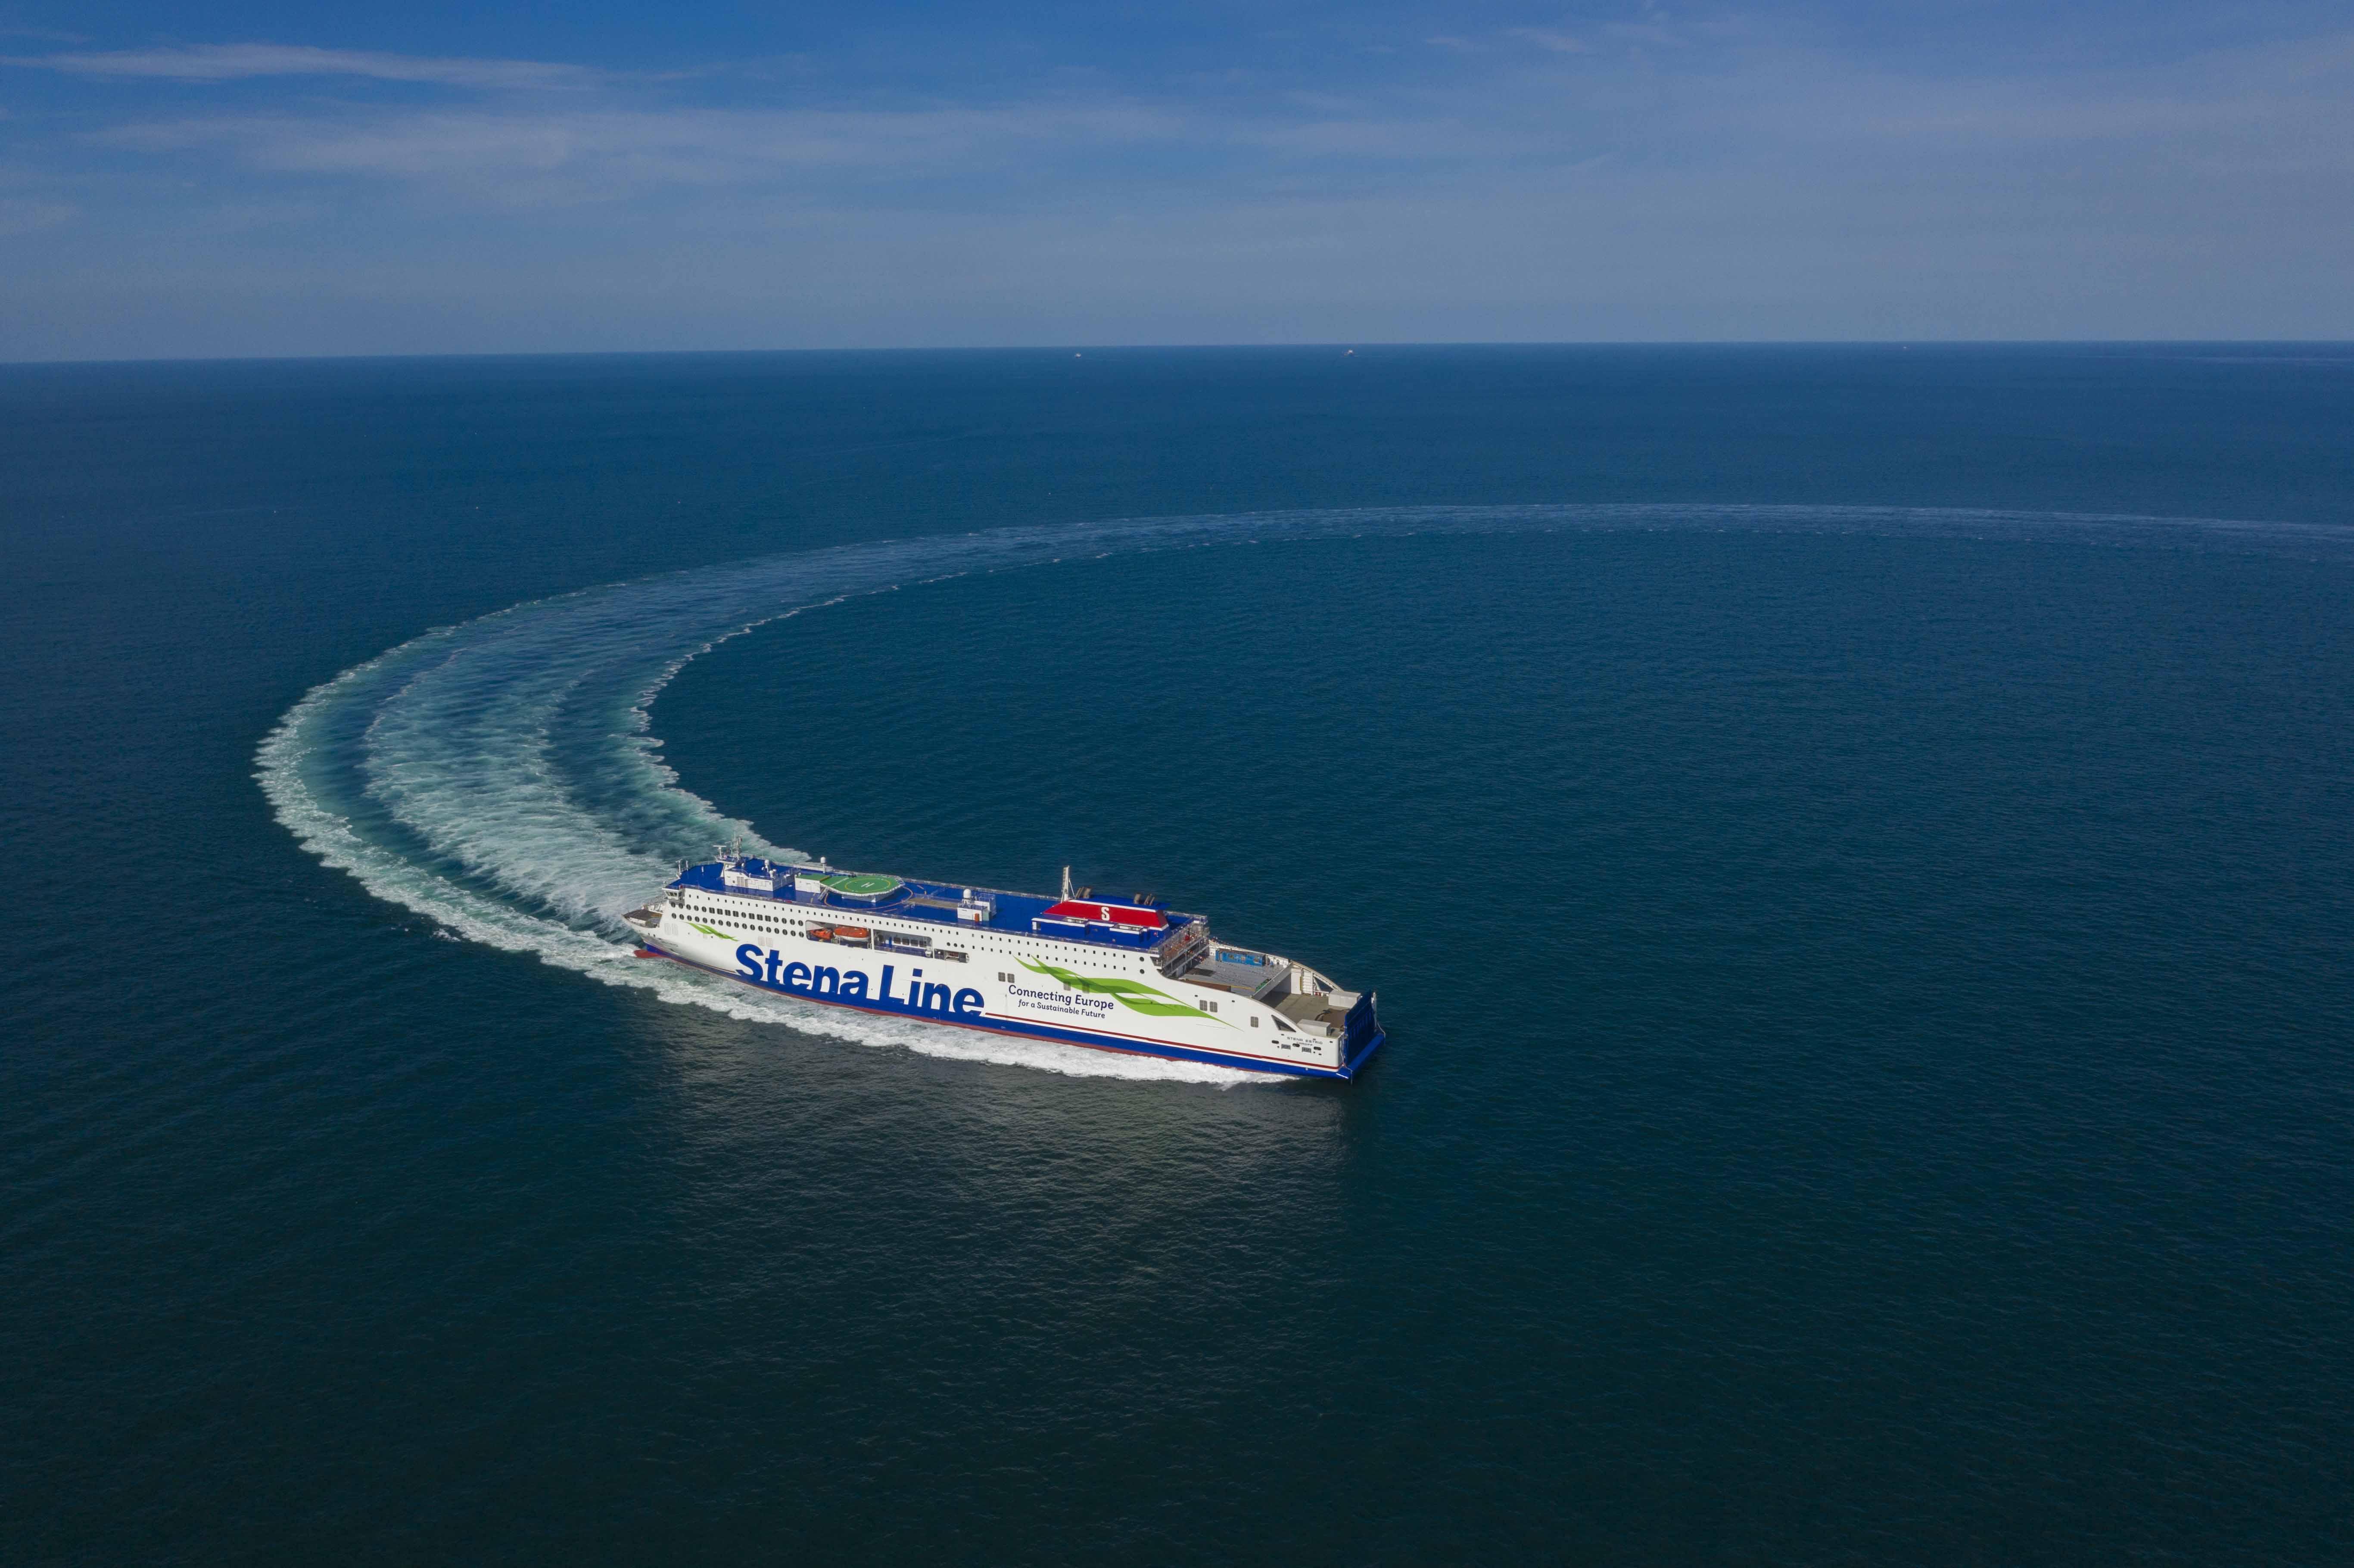 Stena Estrid sea trial #2